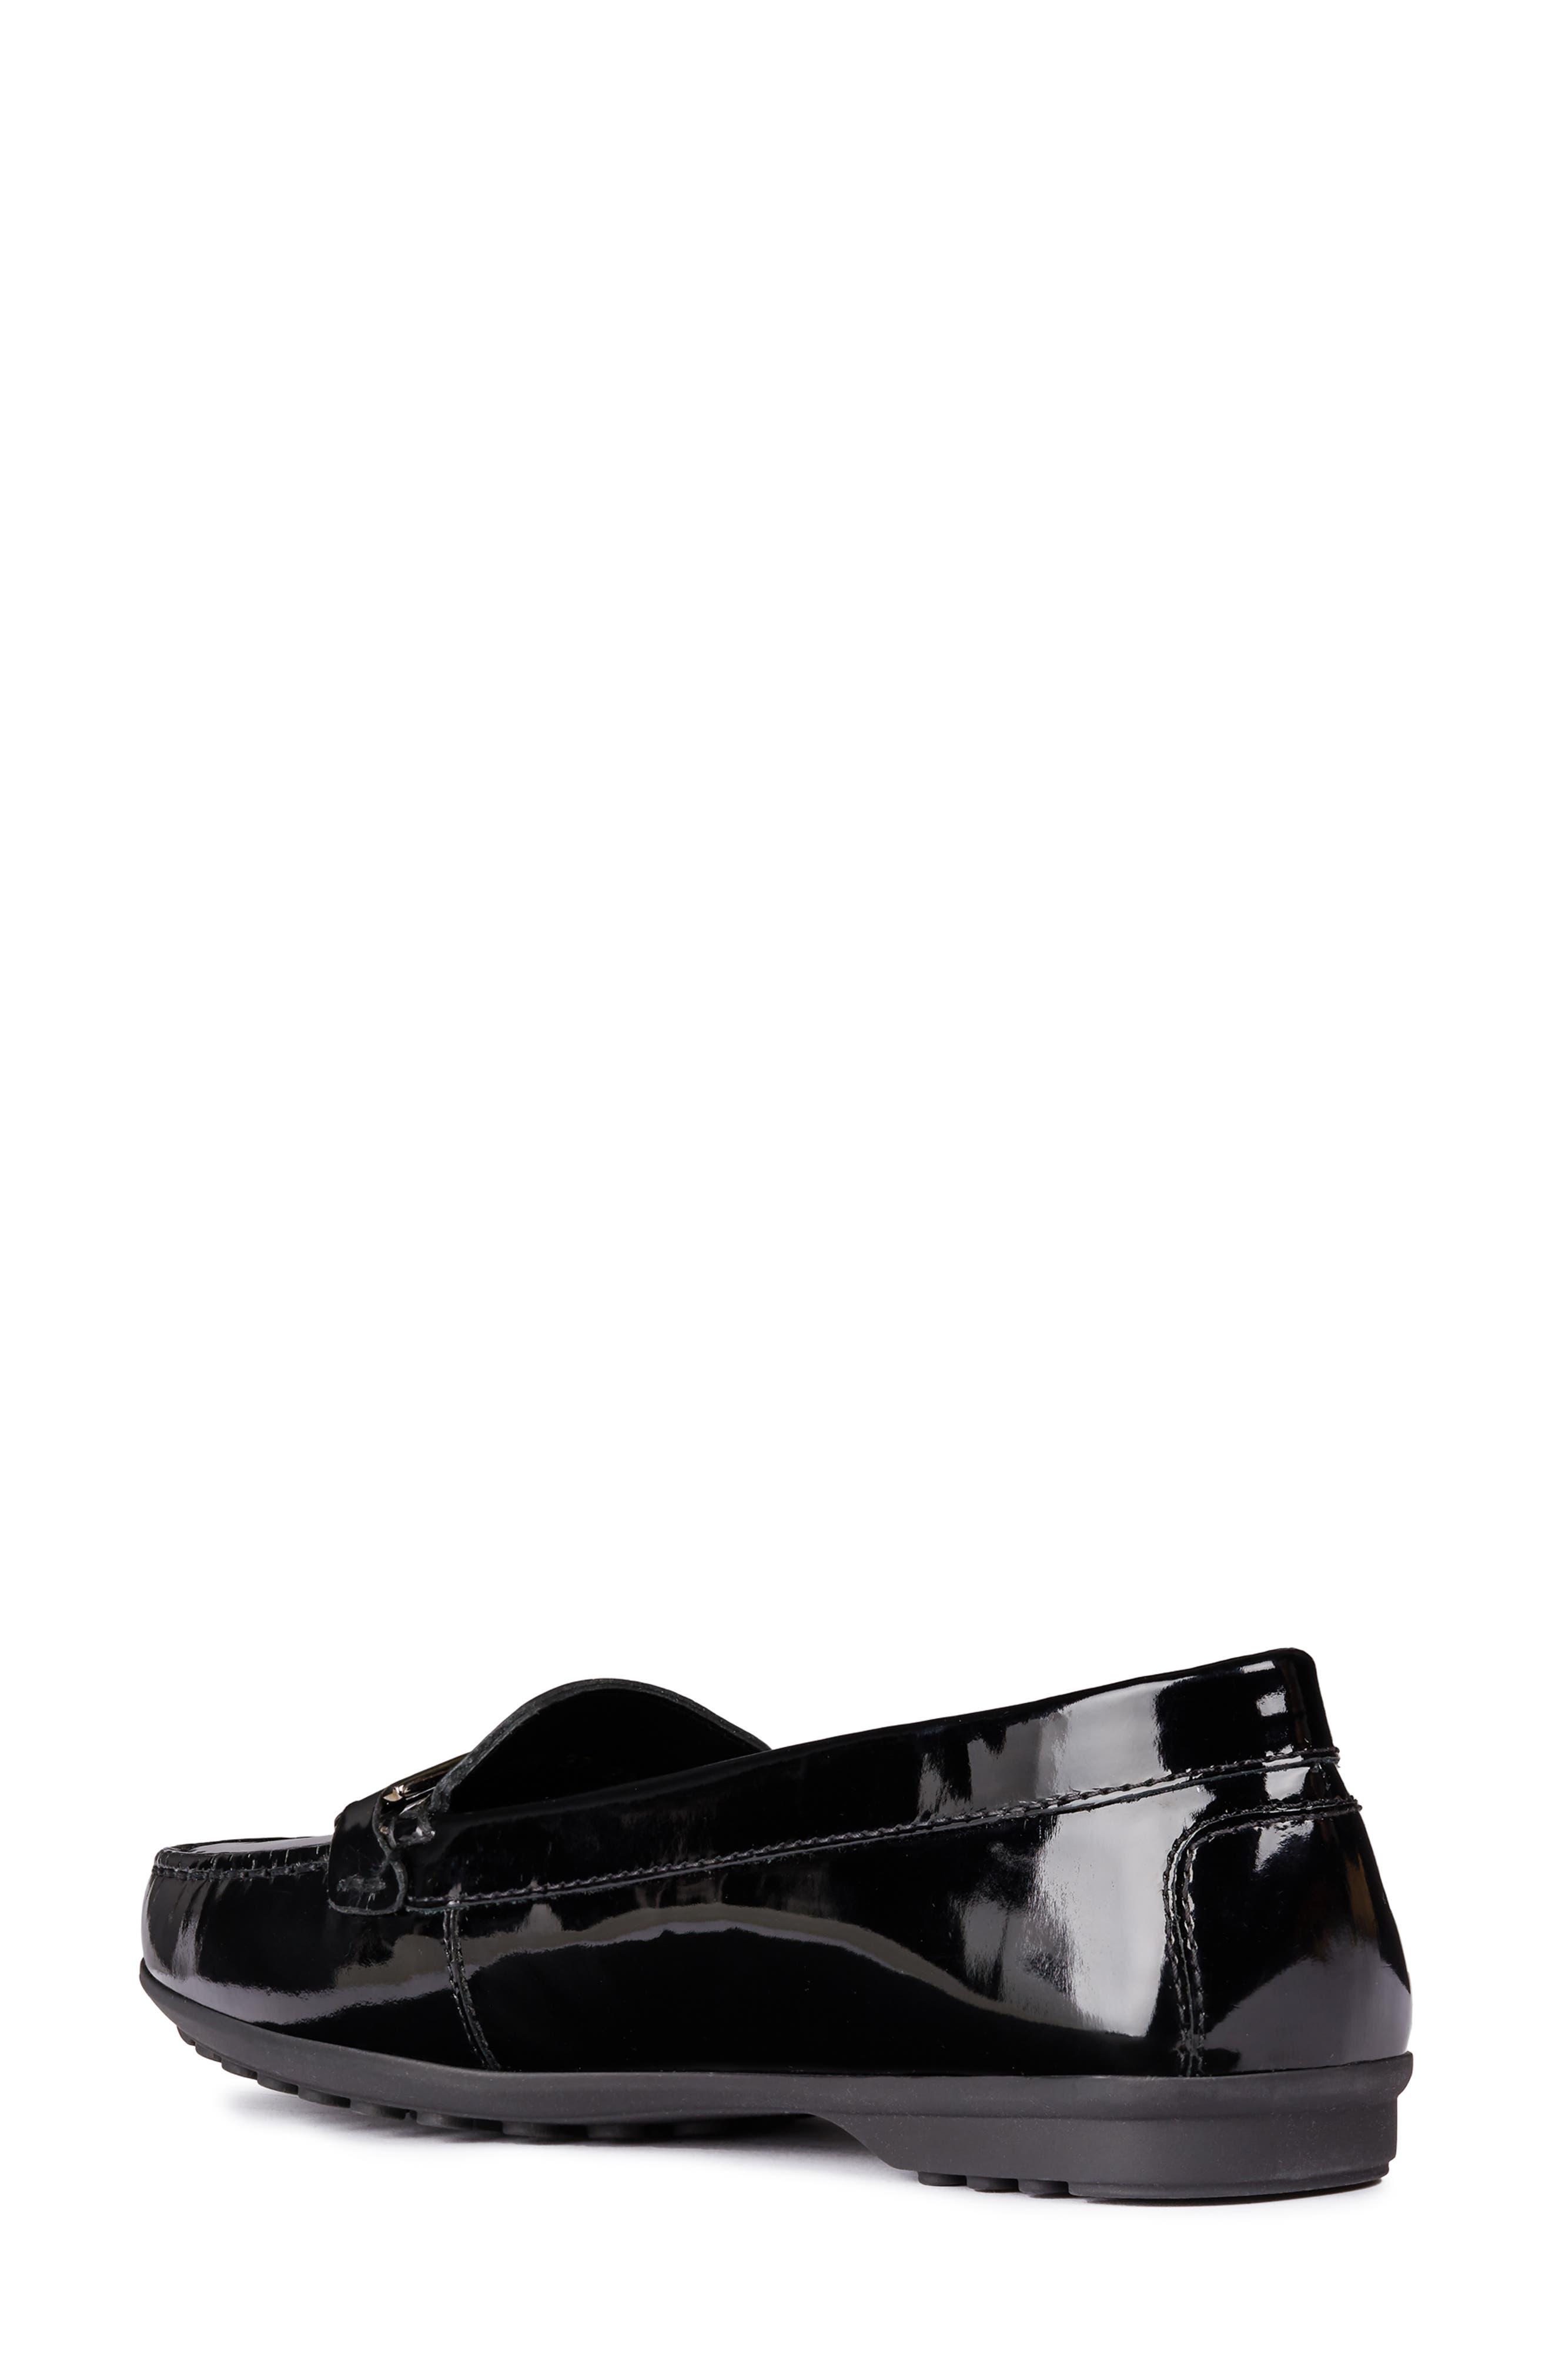 Alidia Loafer,                             Alternate thumbnail 2, color,                             BLACK LEATHER